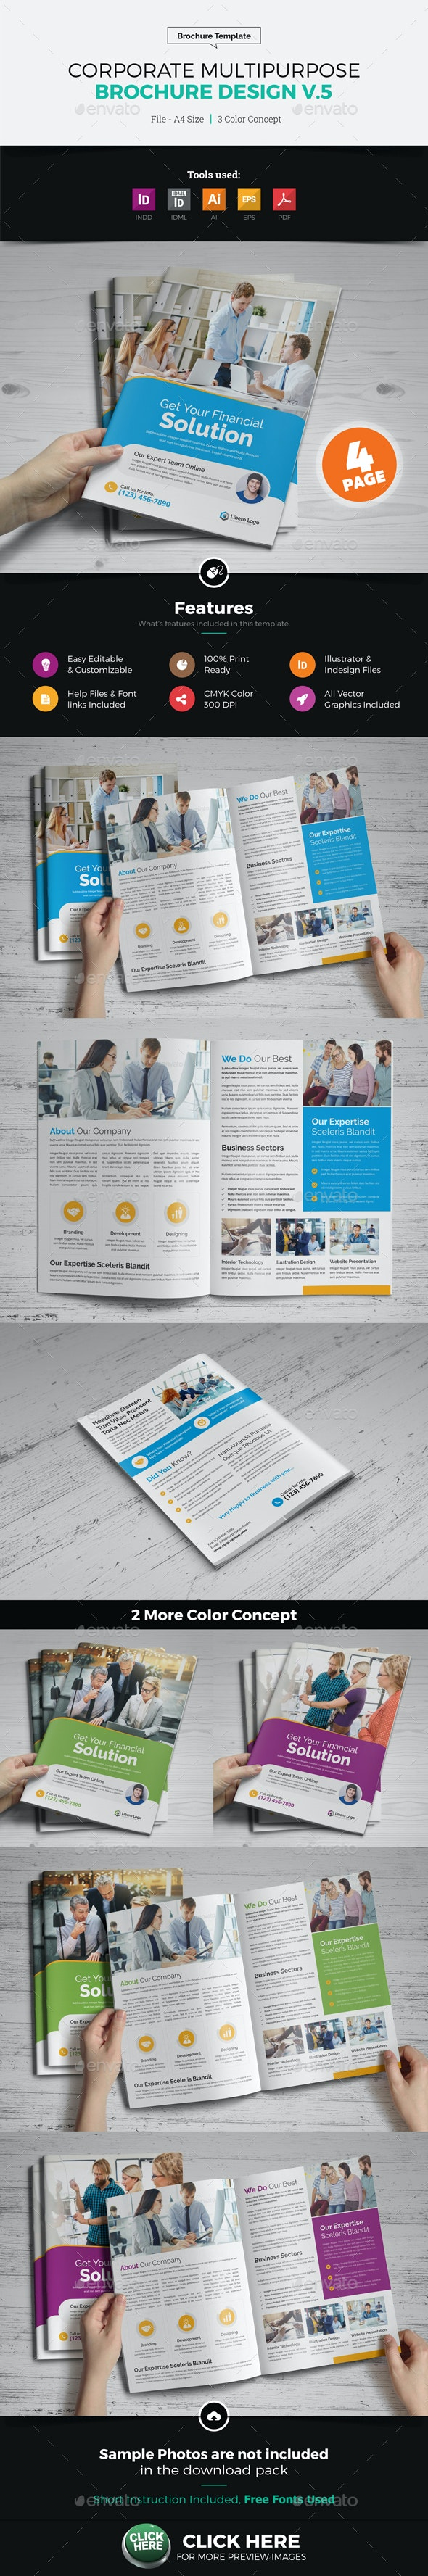 Corporate Multipurpose Brochure Design v5 - Corporate Brochures